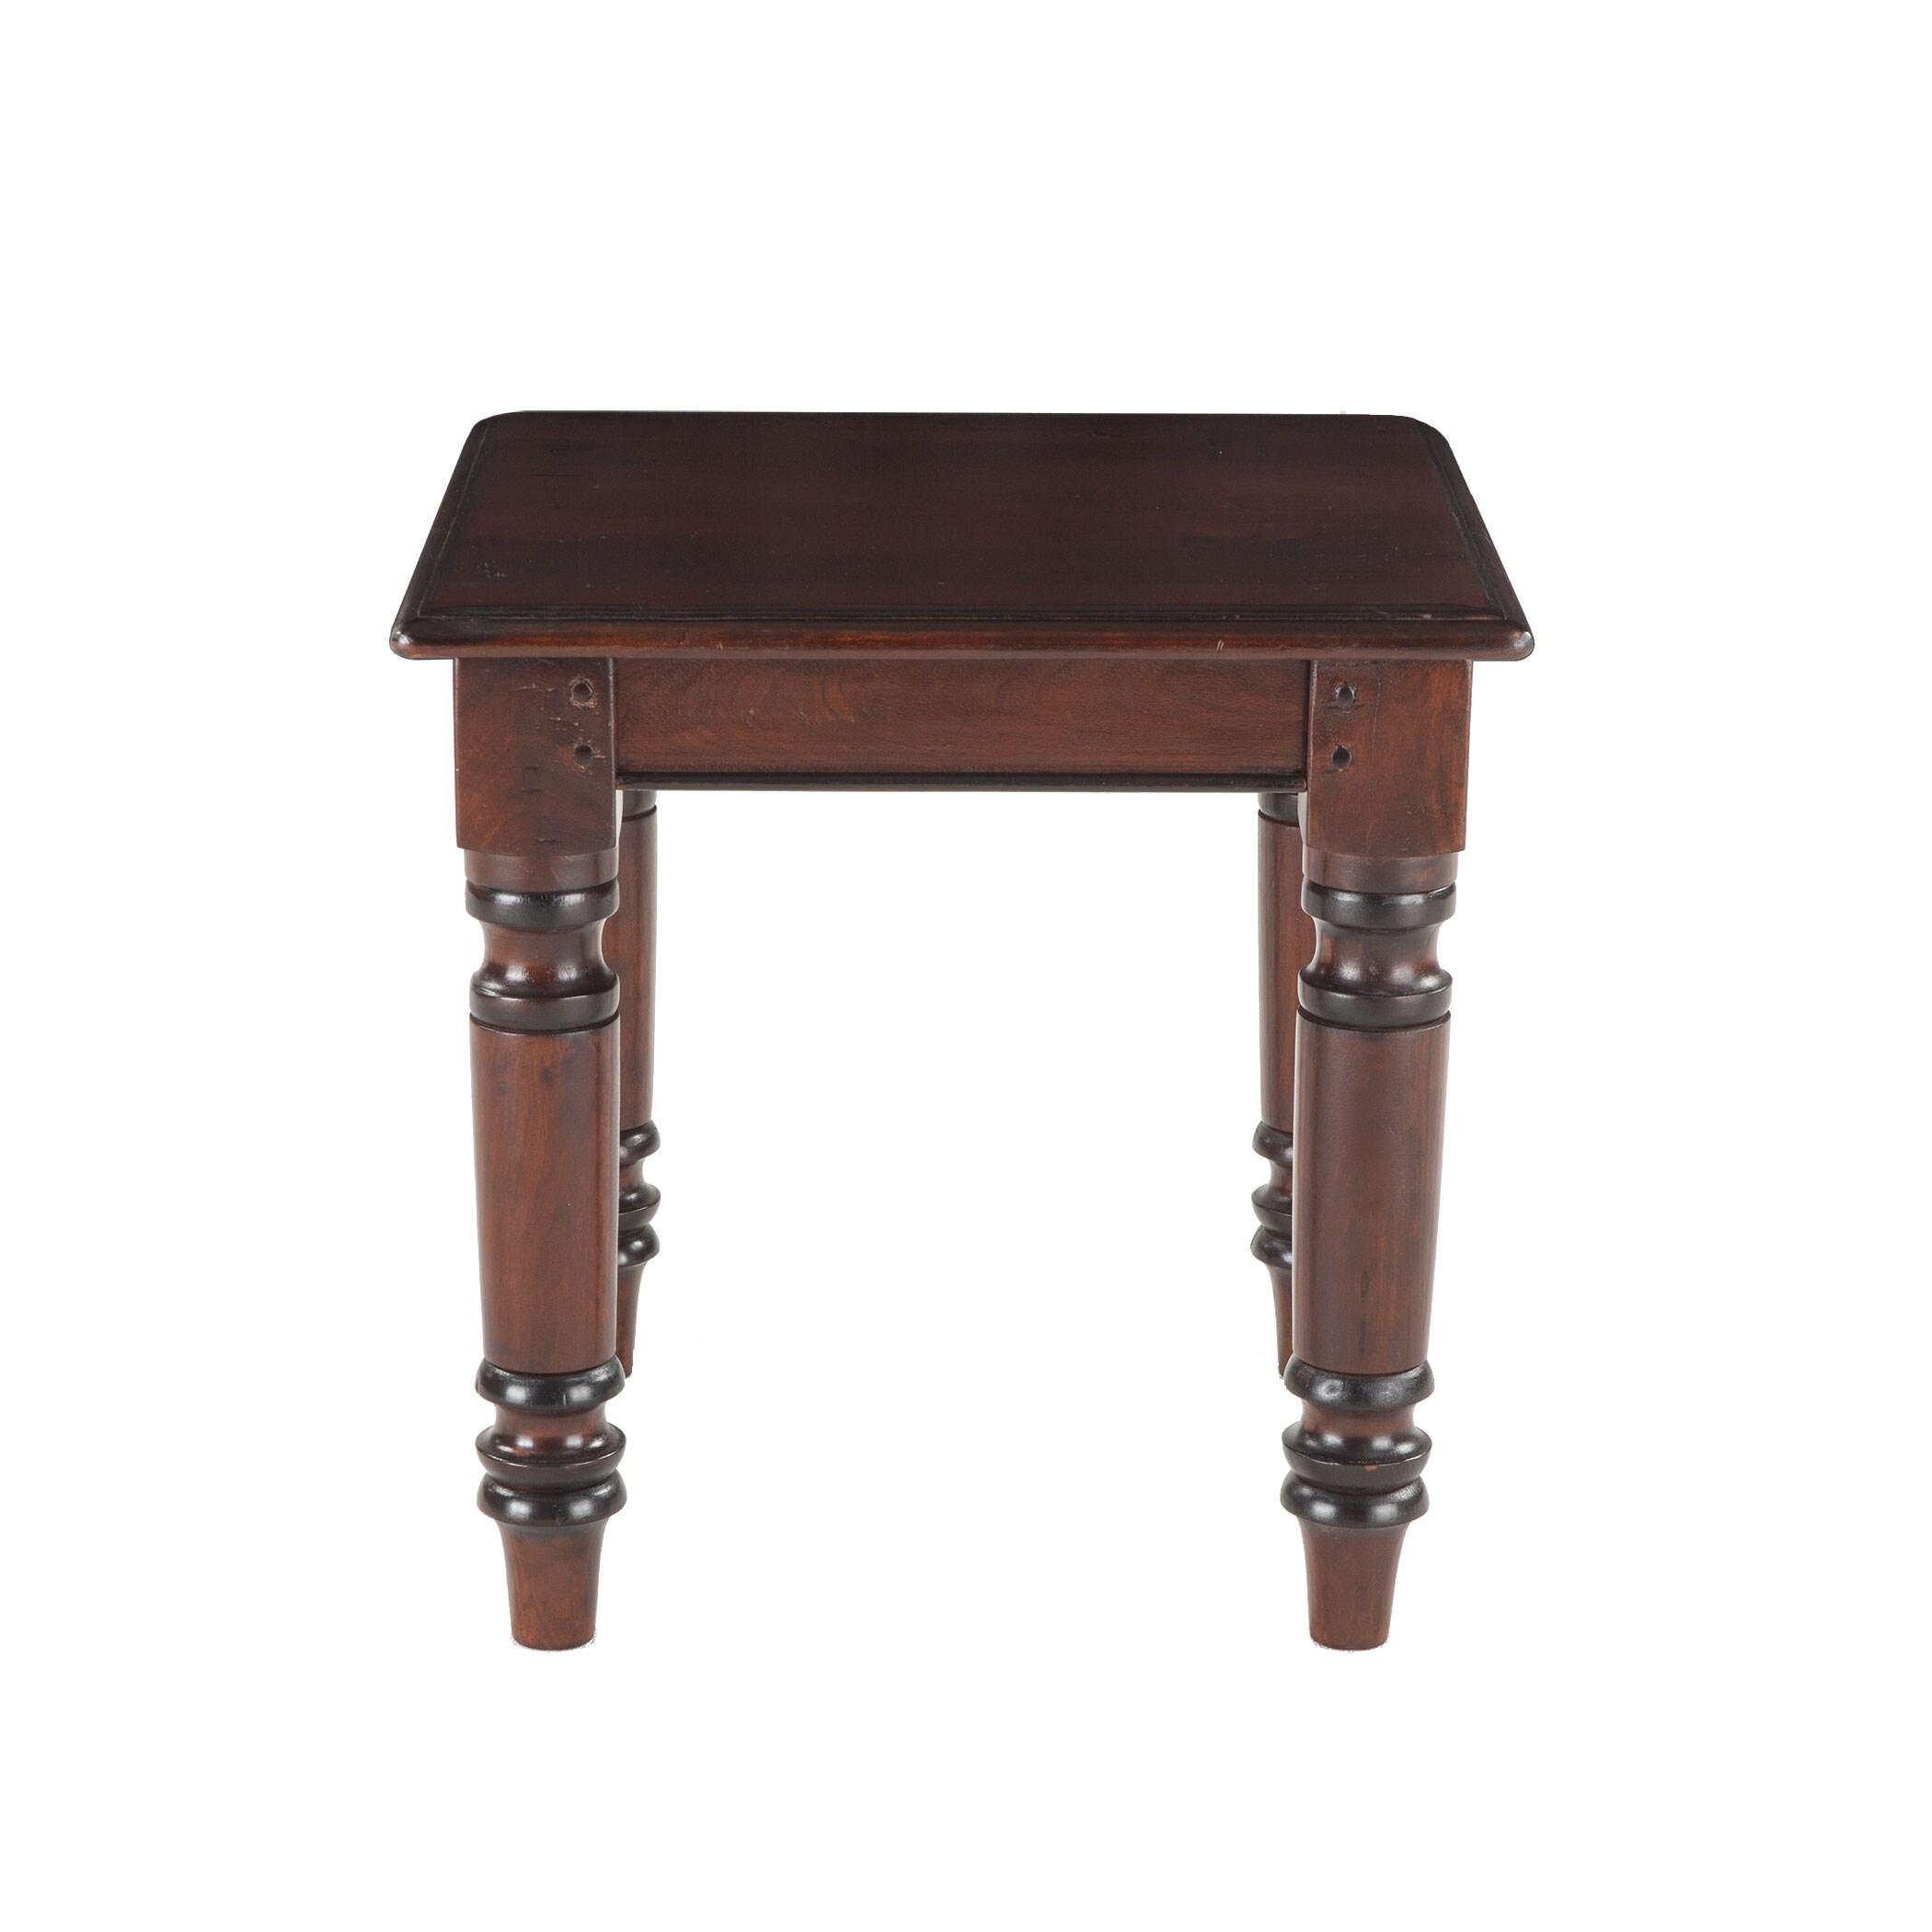 Briva Brown Mango Wood Square Side Table (European Rustic...